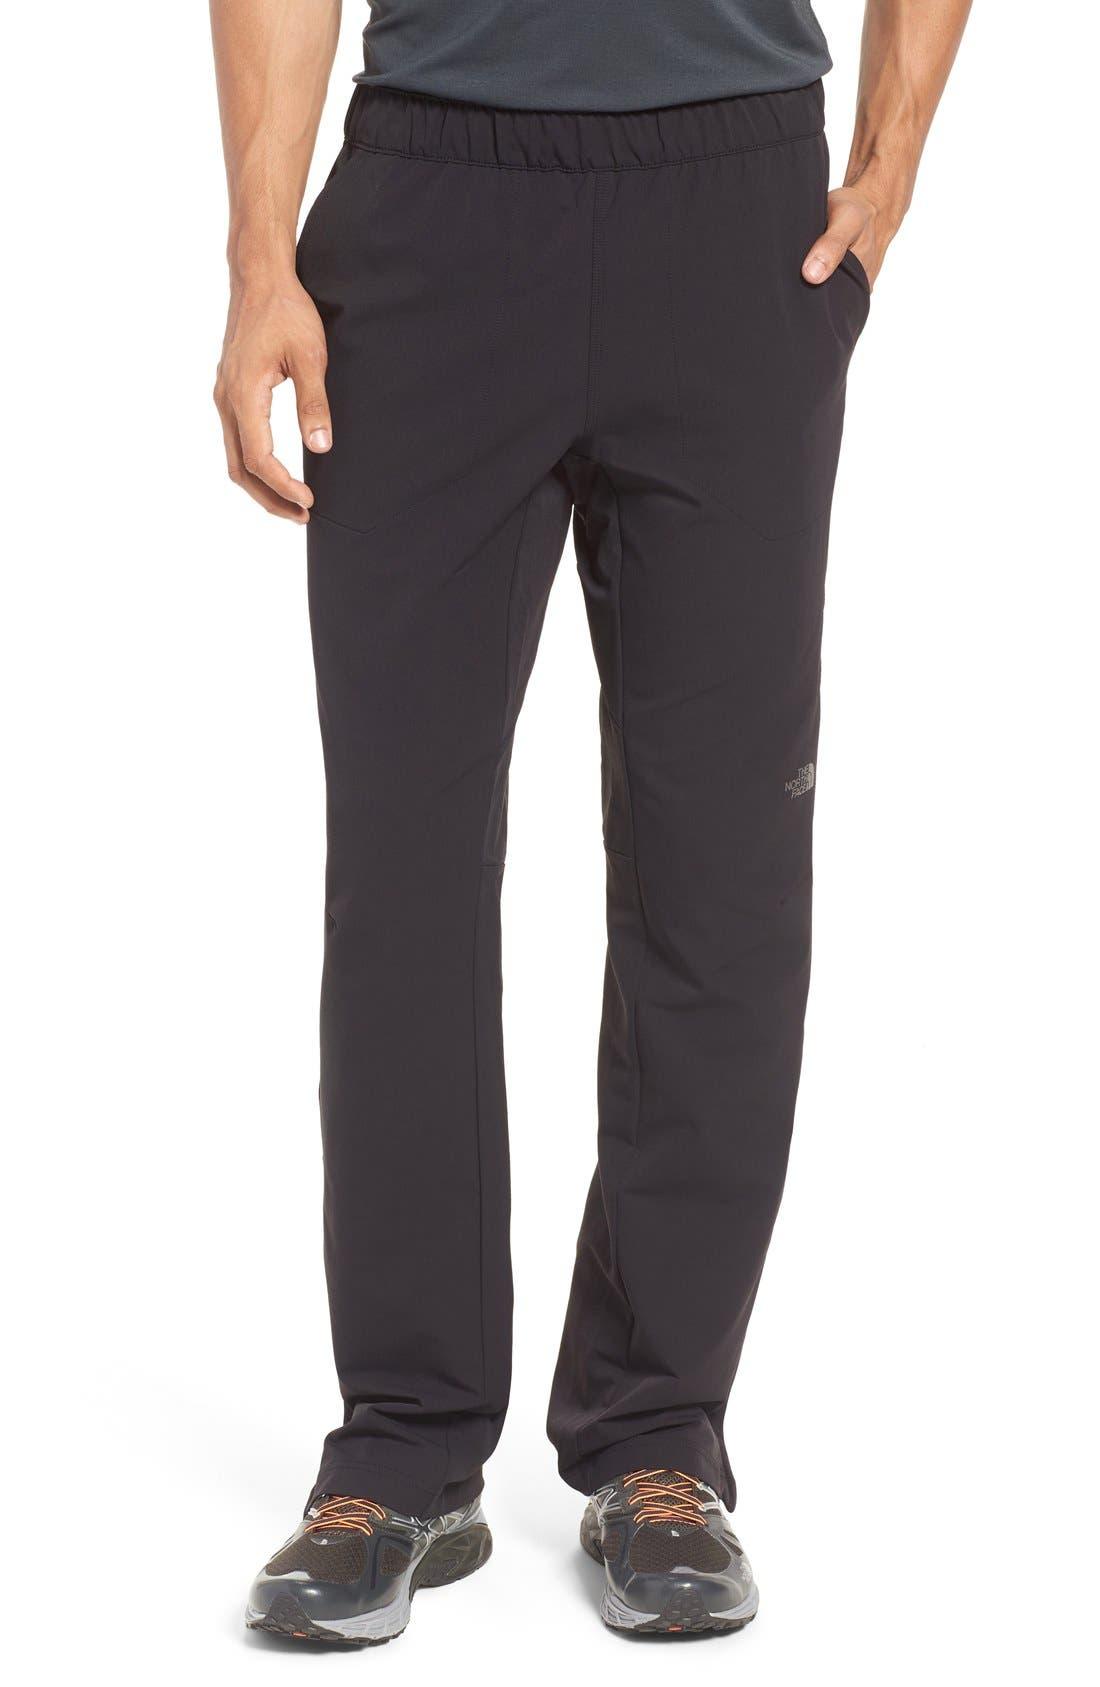 'Kilowatt' Training Pants,                         Main,                         color, Tnf Black